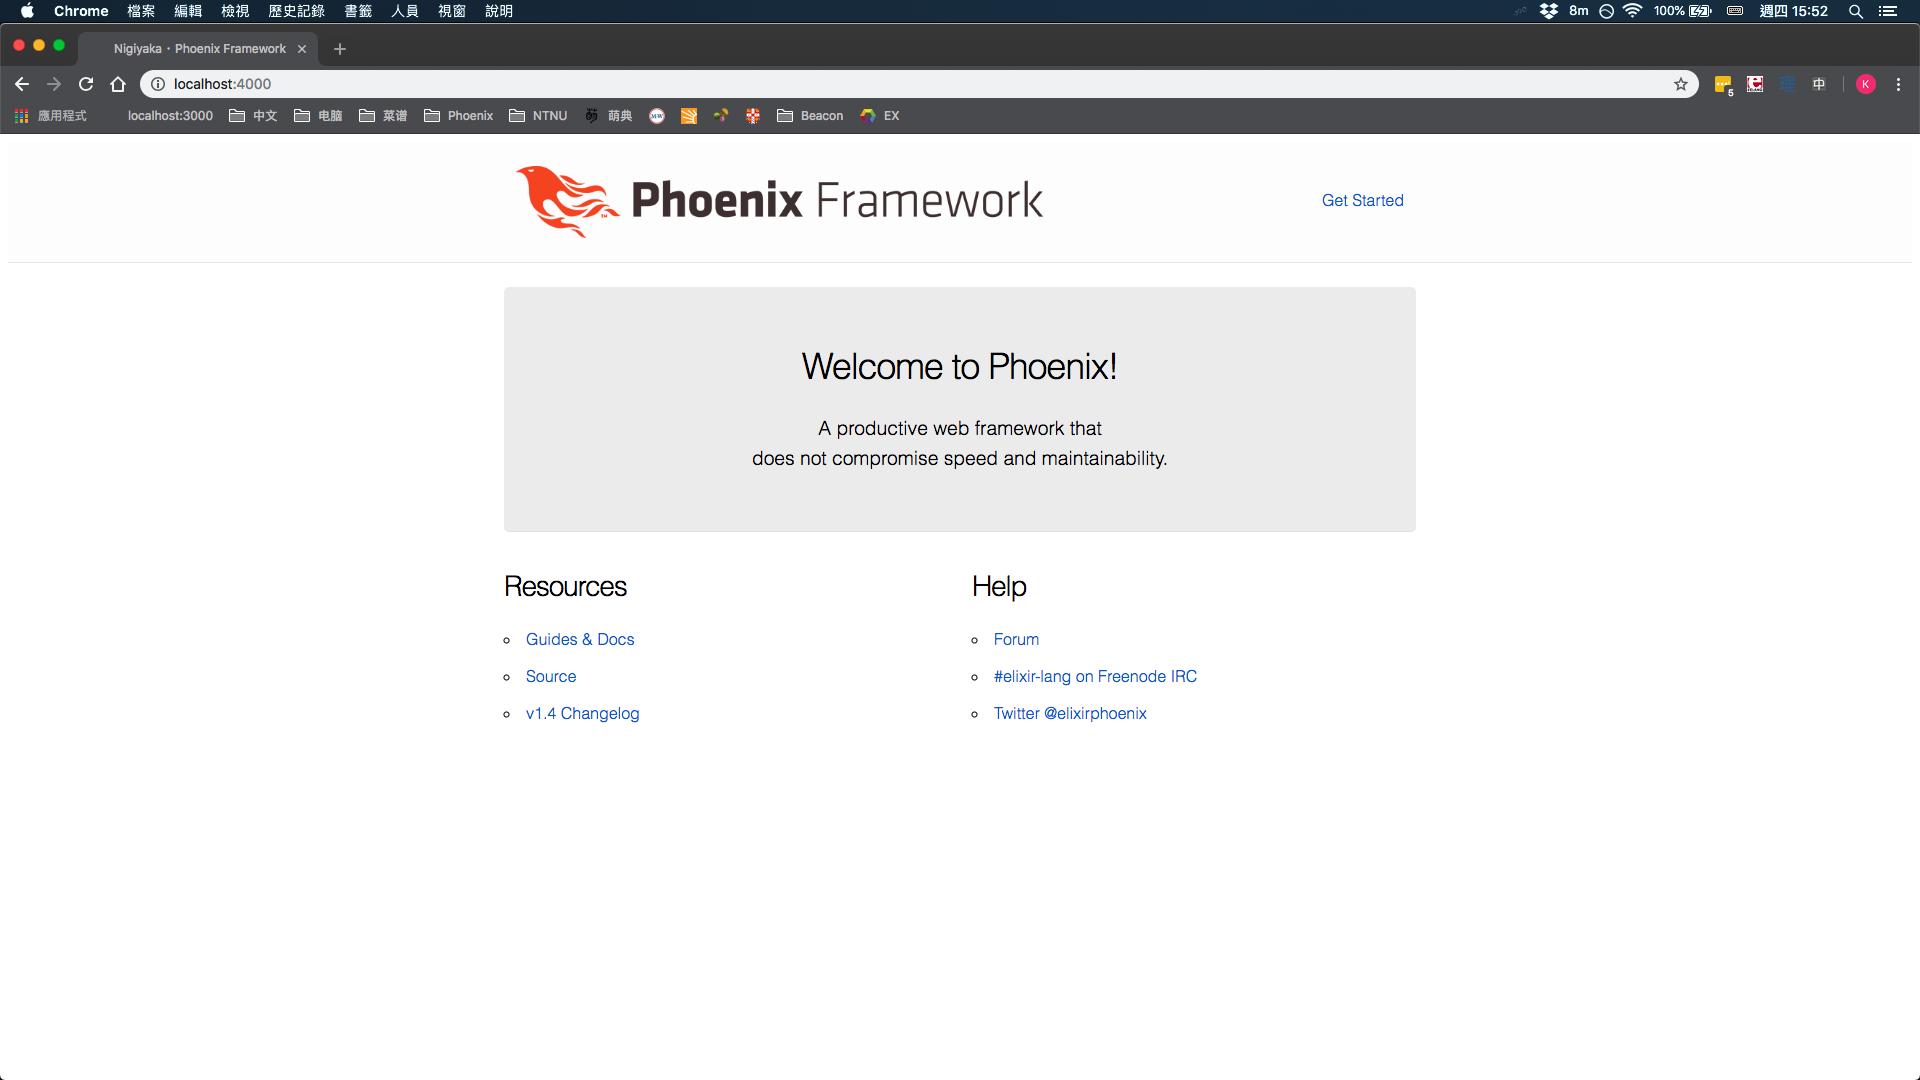 Image: 210-new-phoenix-app.png (no description provided)